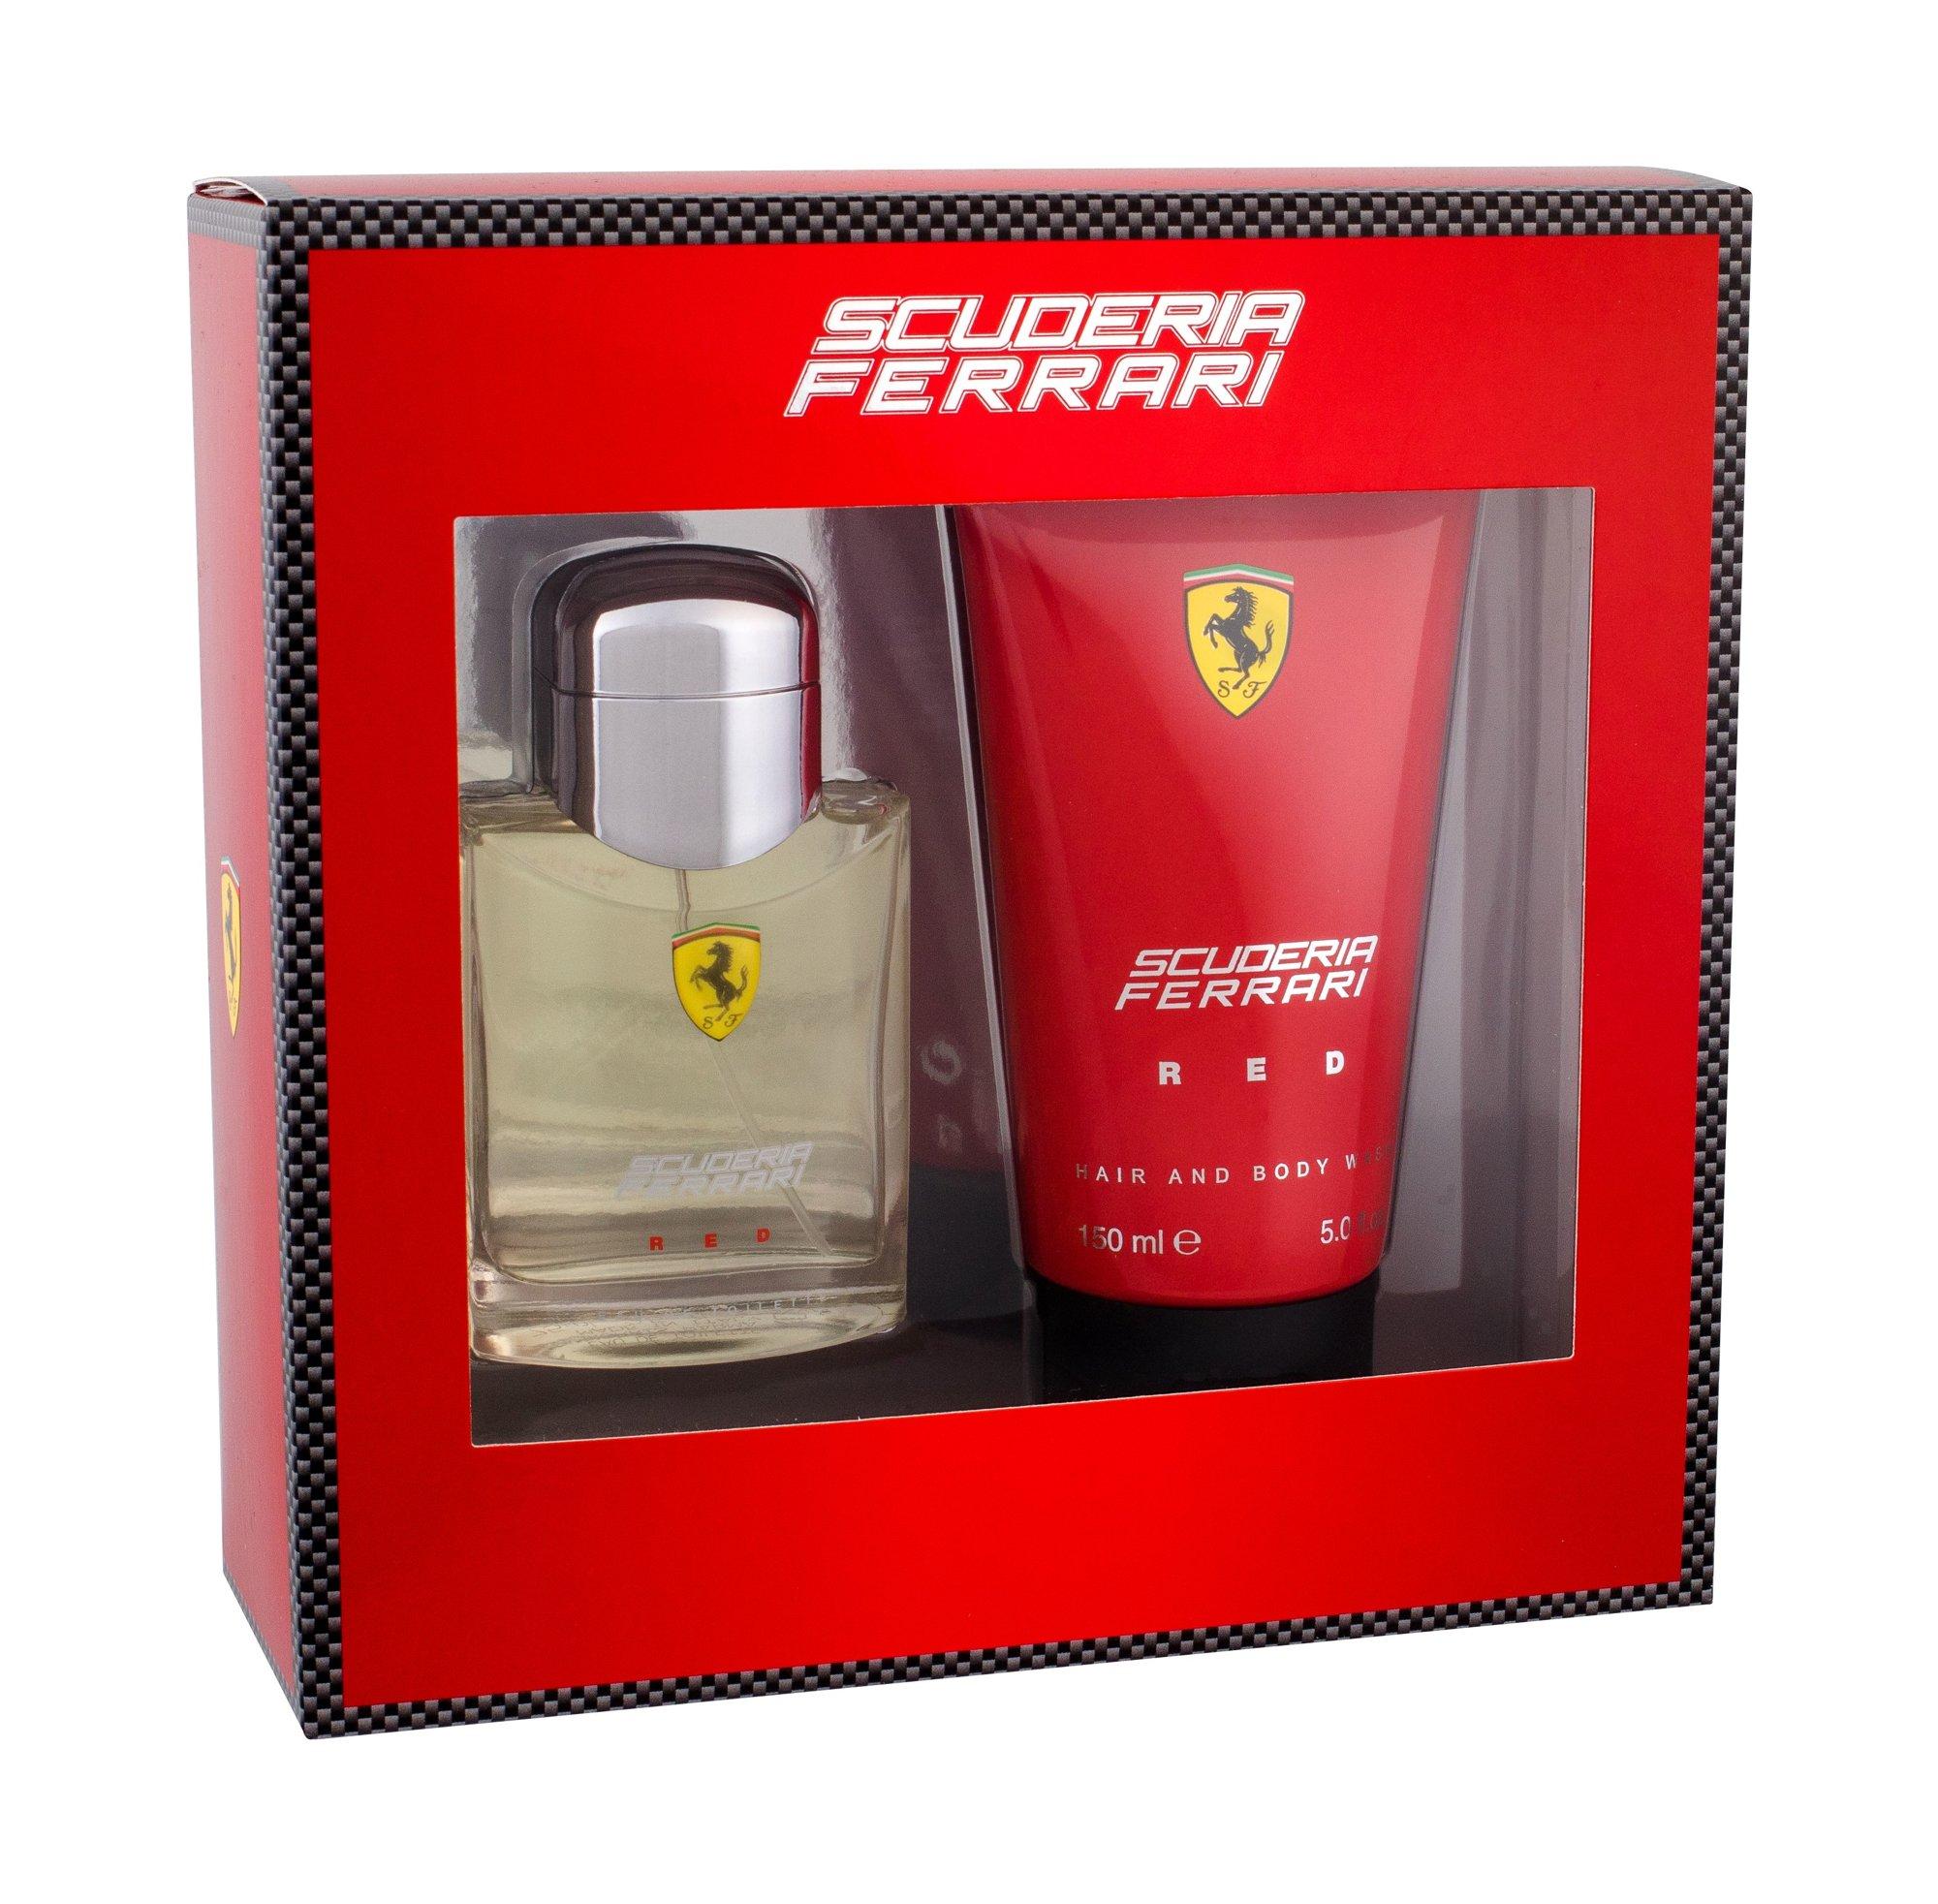 Kvepalai Ferrari Scuderia Ferrari Red